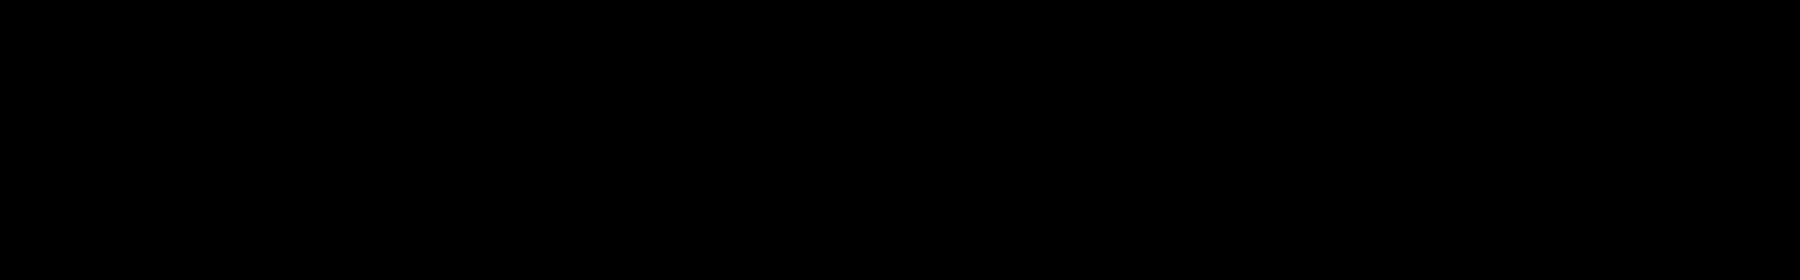 Cyber Signature: u-he Hive 2 Presets audio waveform